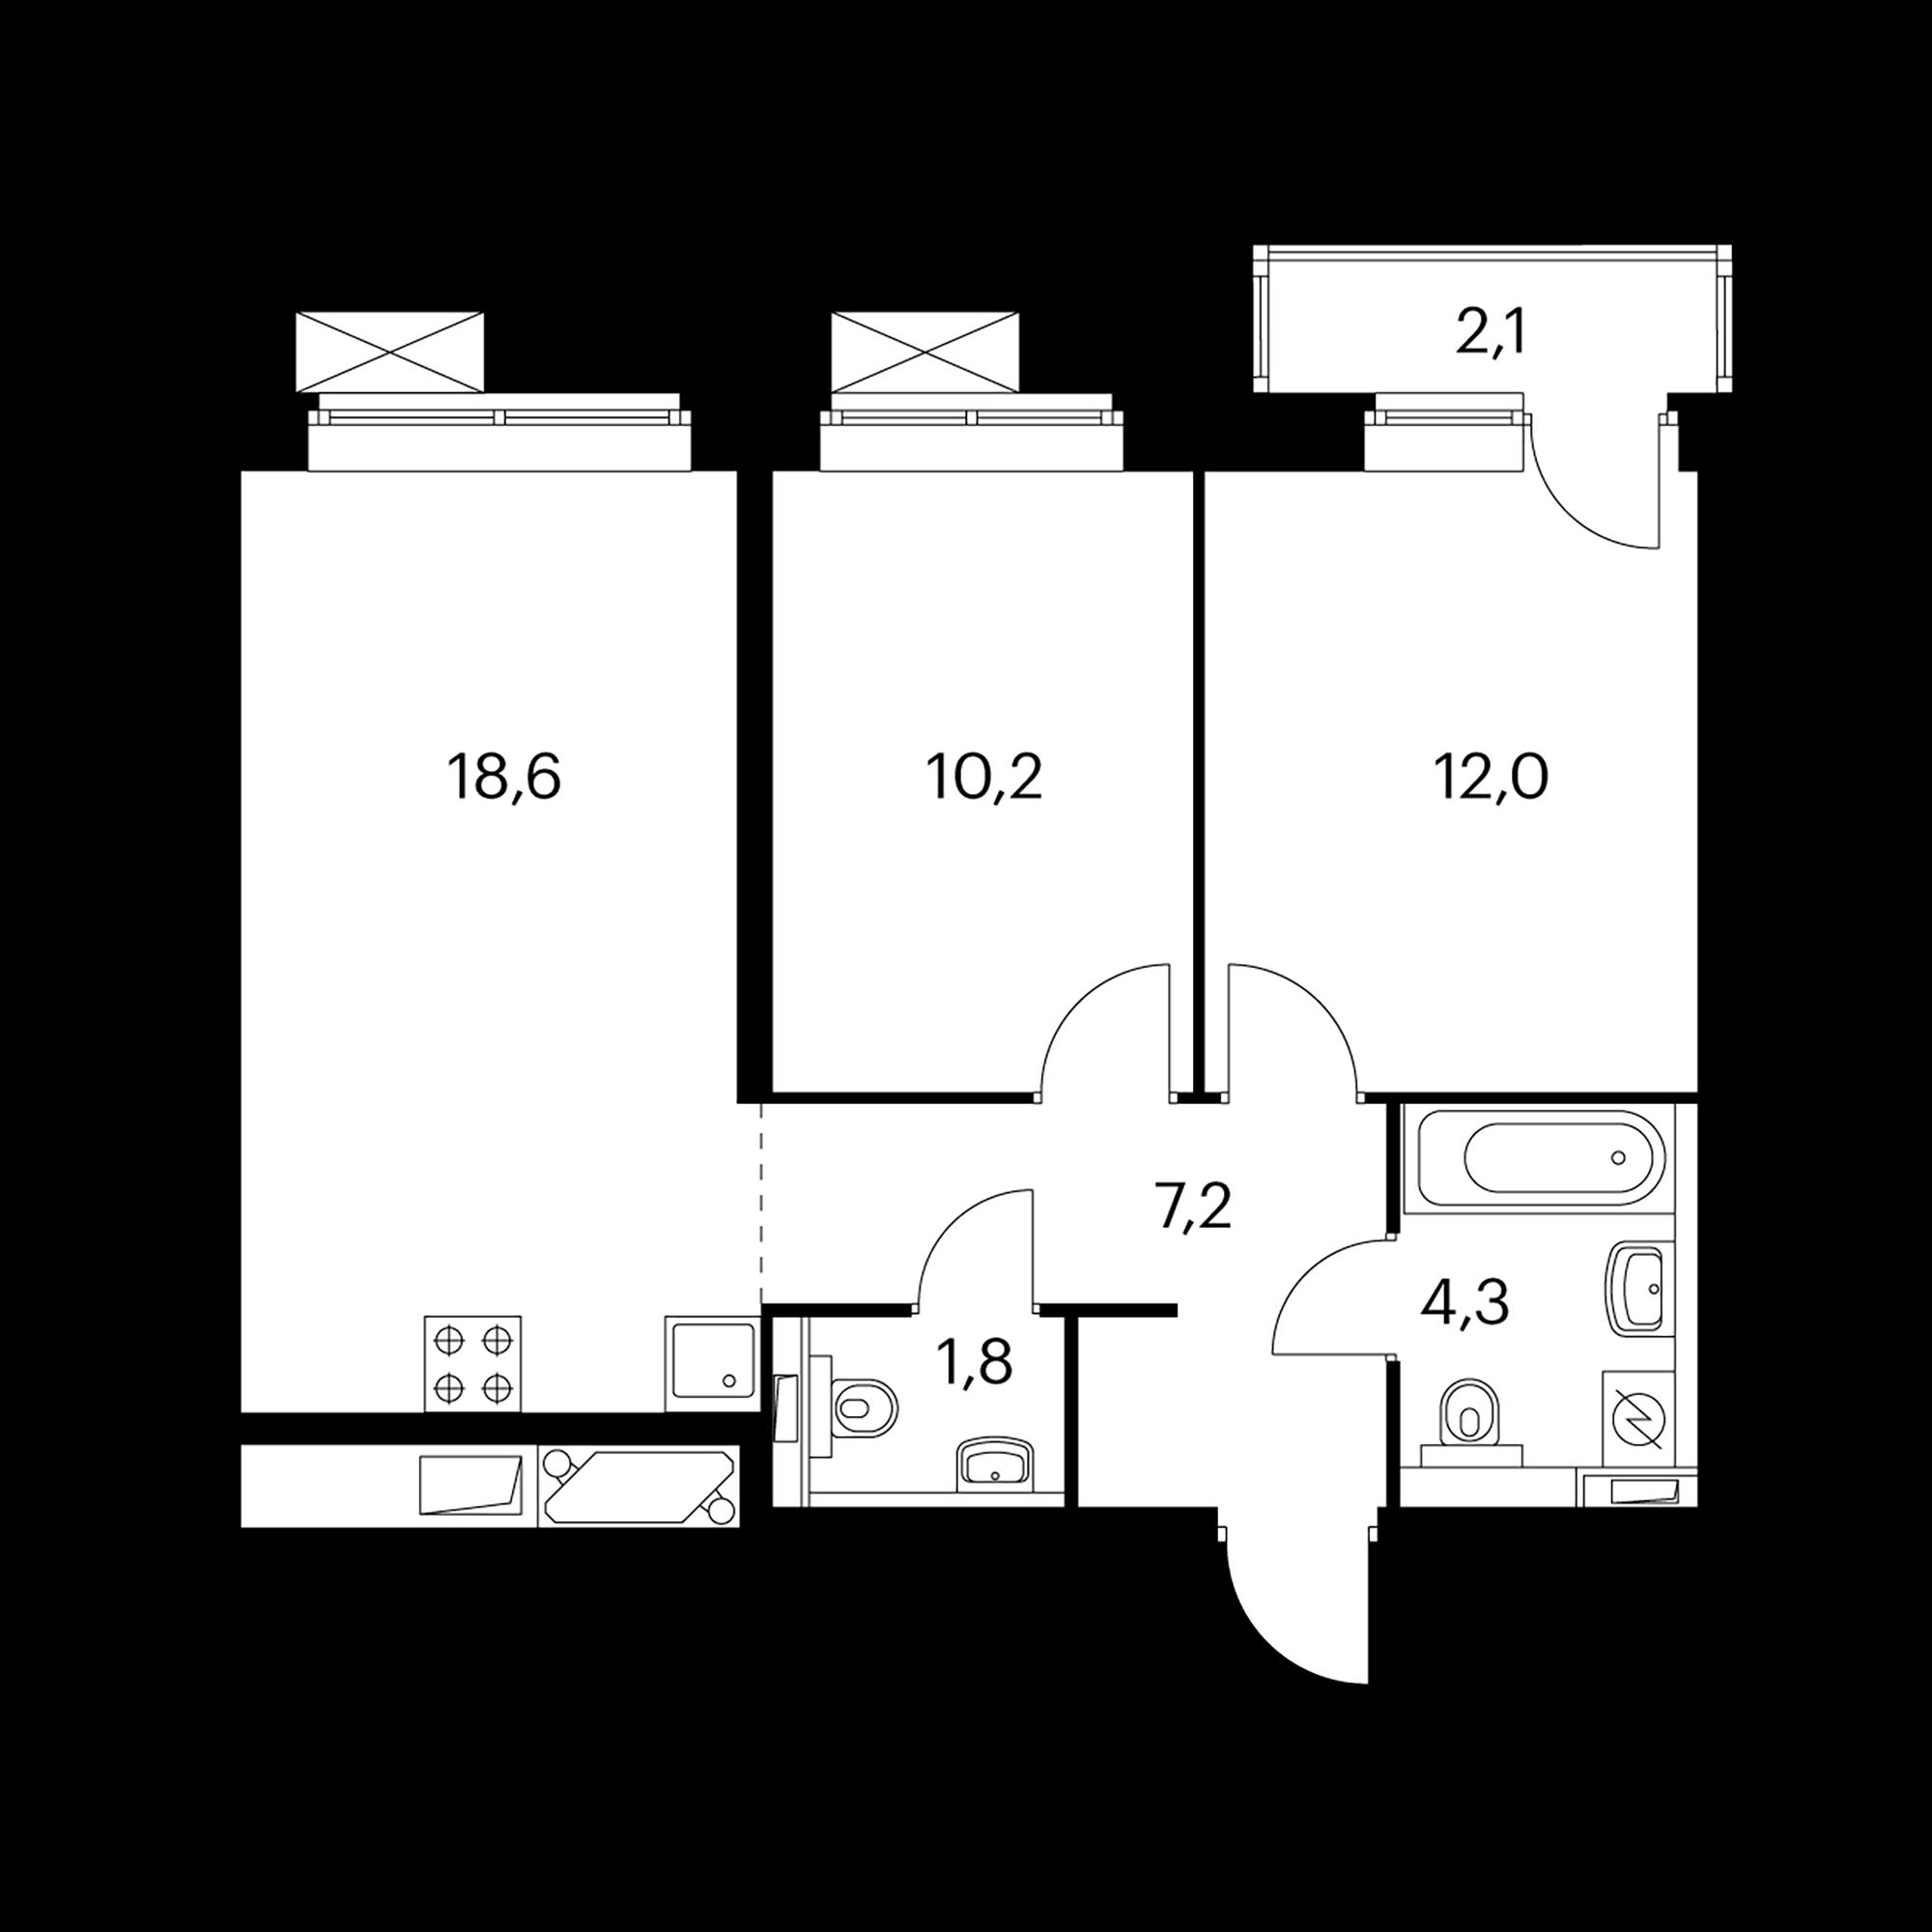 2ES8_9.3-B